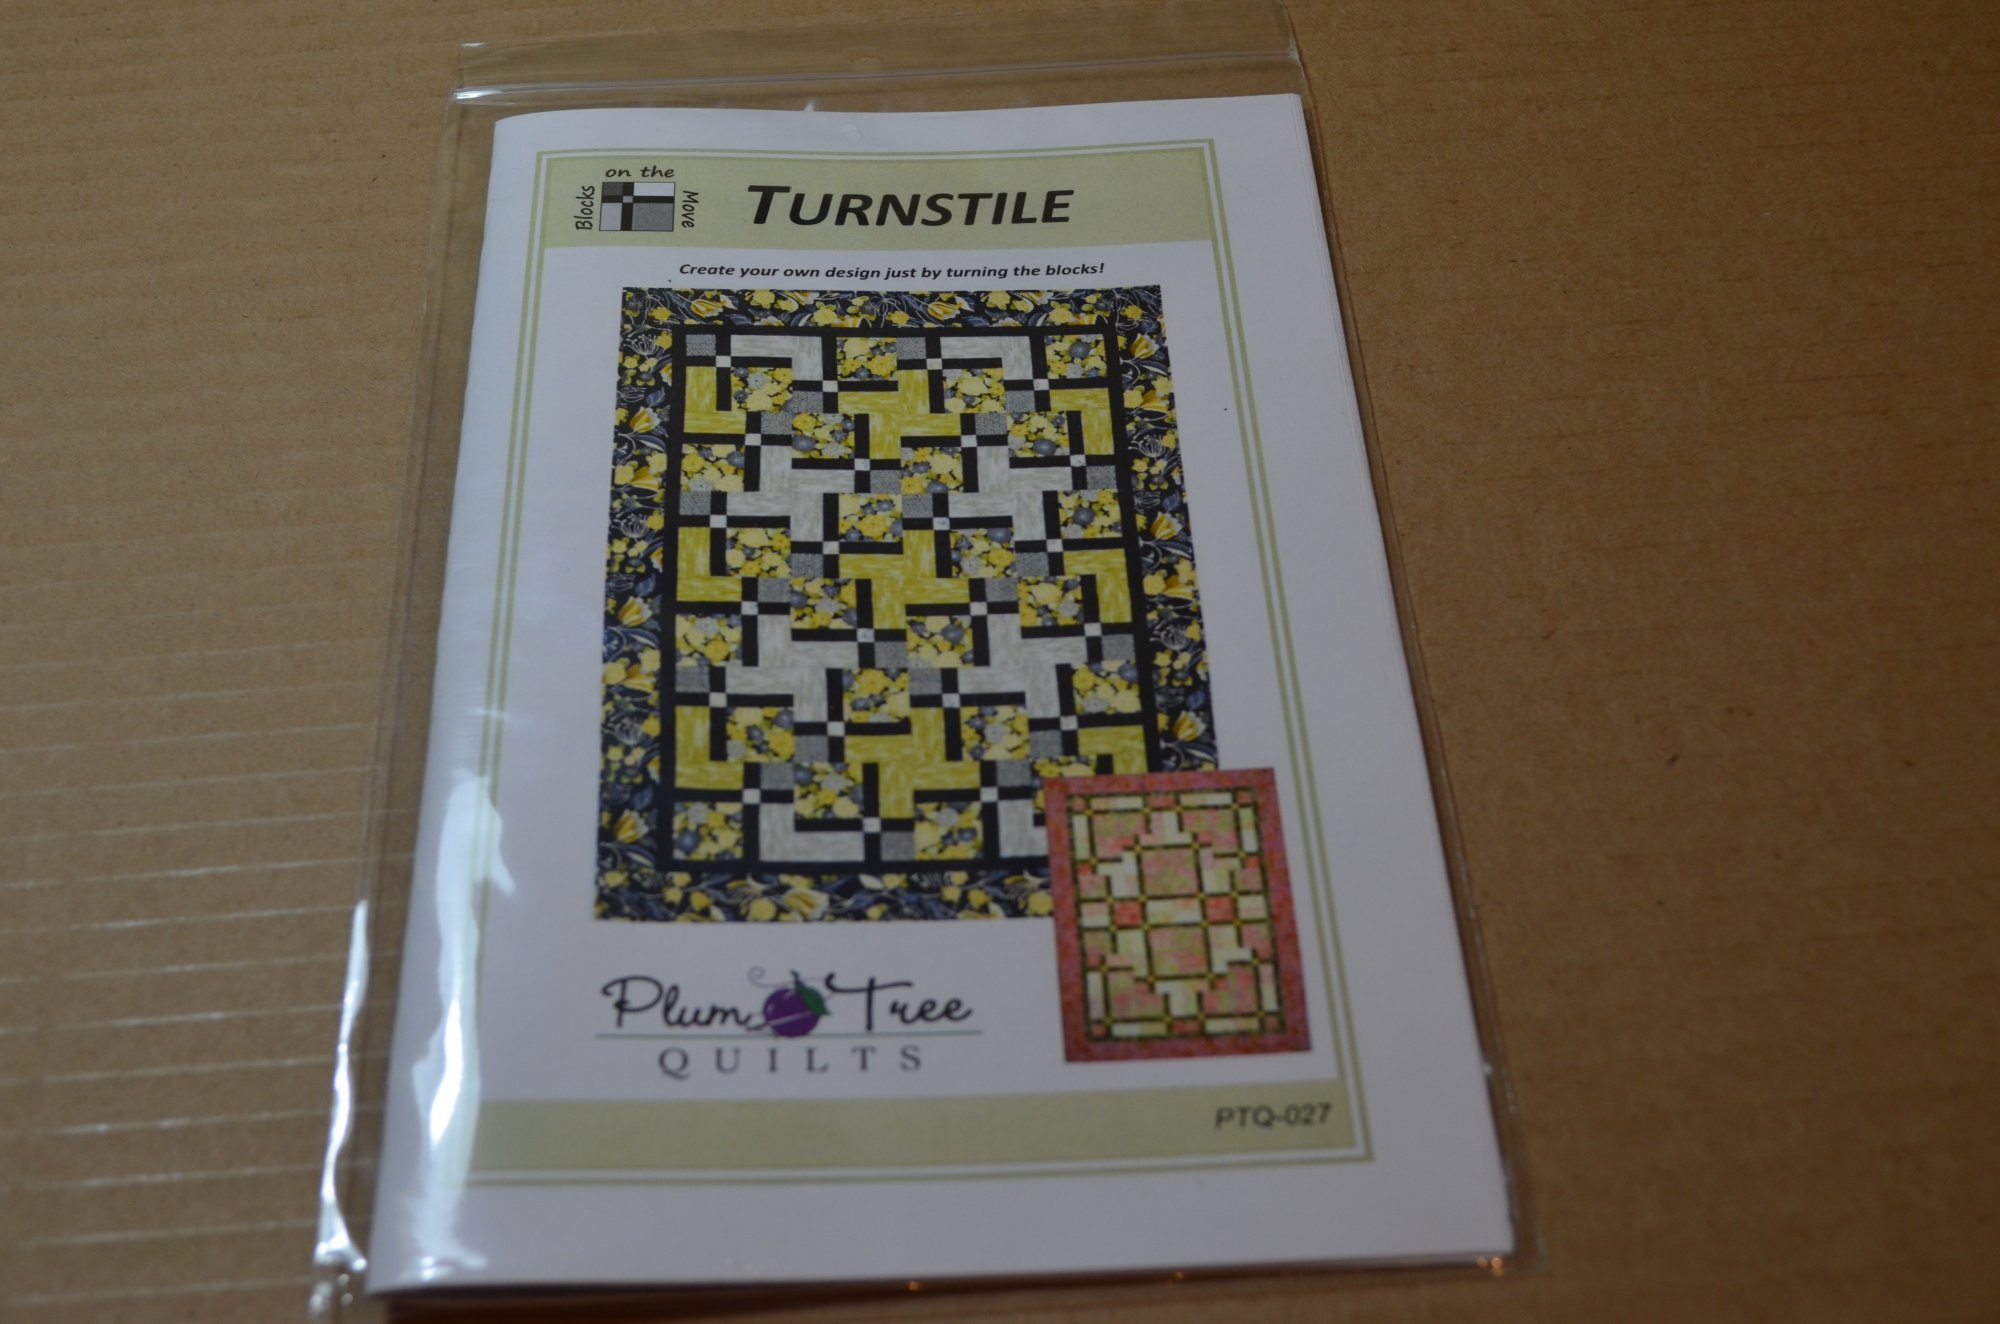 TURNSTILE PATTERN By: Plum Tree  PTQ027